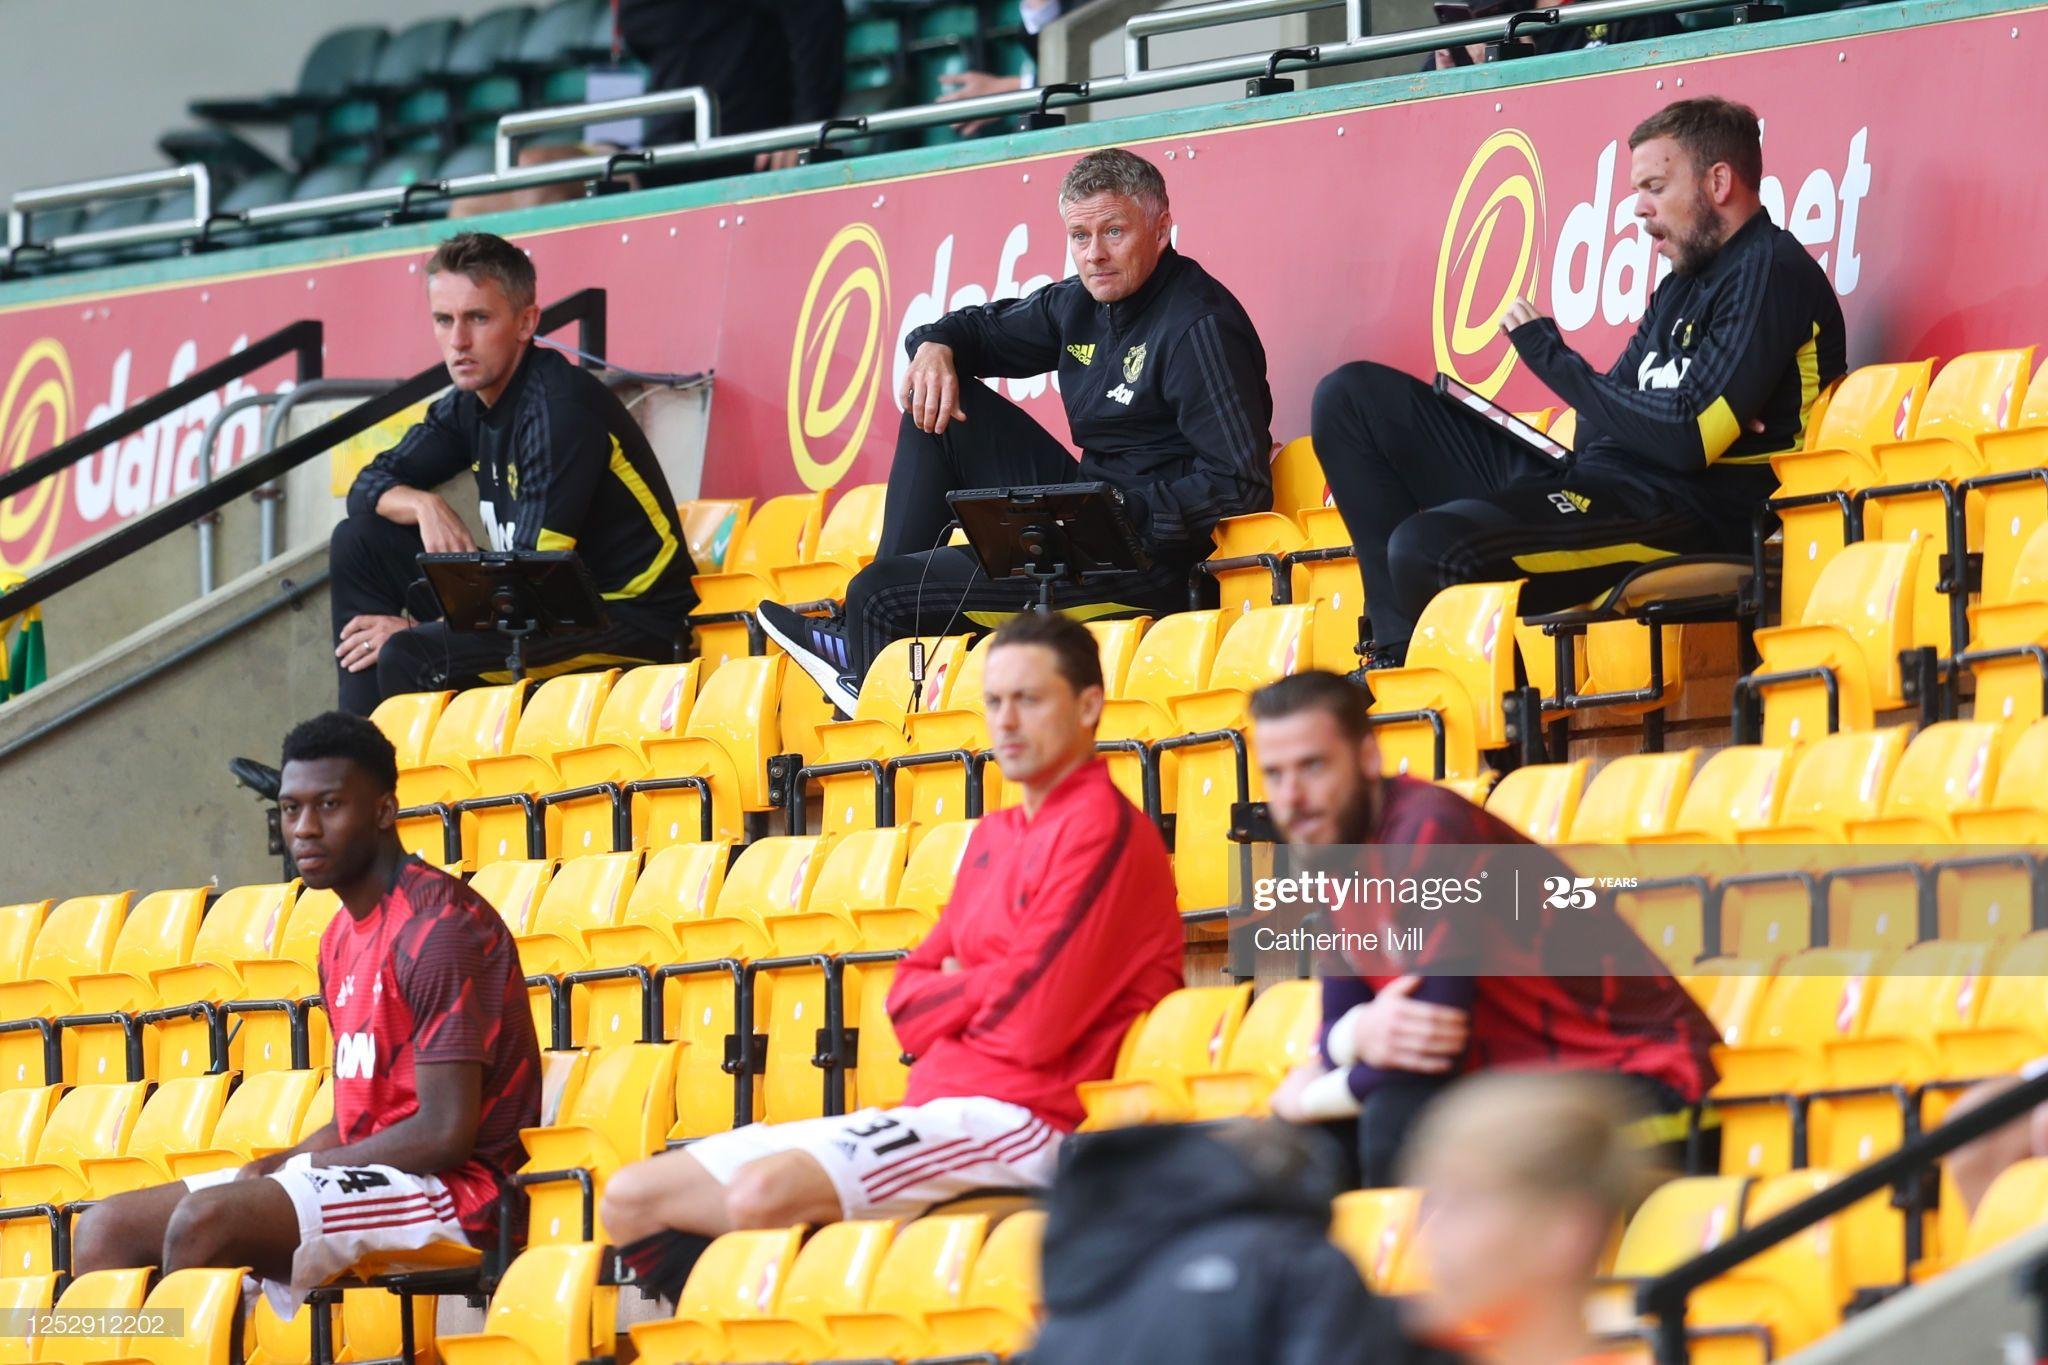 Ole Gunnar Solskjaer Manager Of Manchester United Is Seen Sitting In In 2020 Ole Gunnar Solskjaer Manchester United Manchester